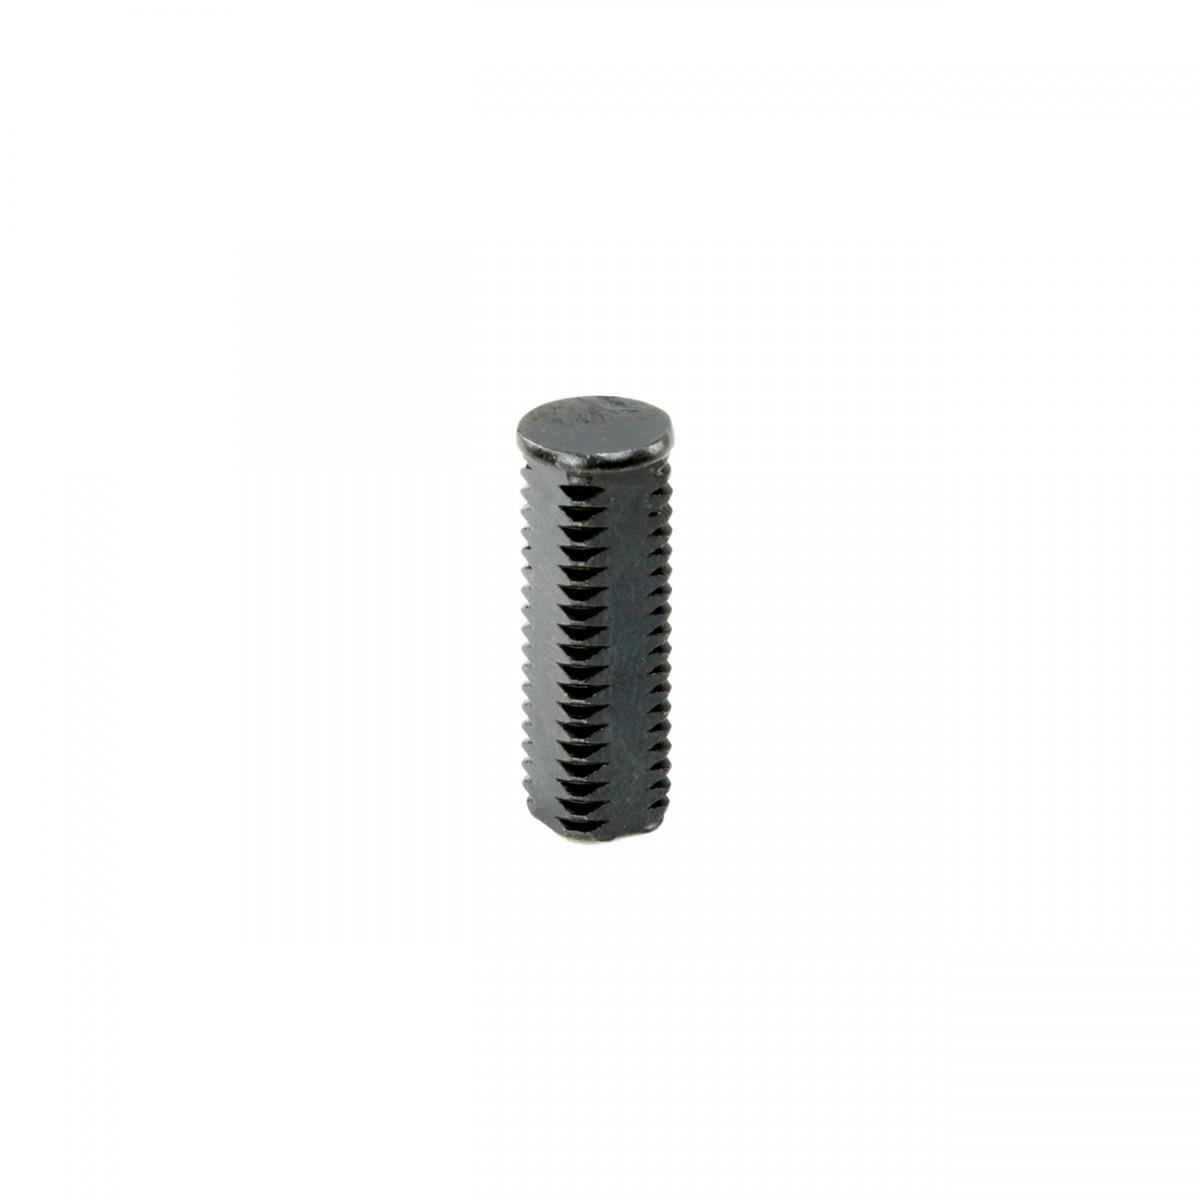 Steel Spindle for Doorknob Dummy Hinge 20152